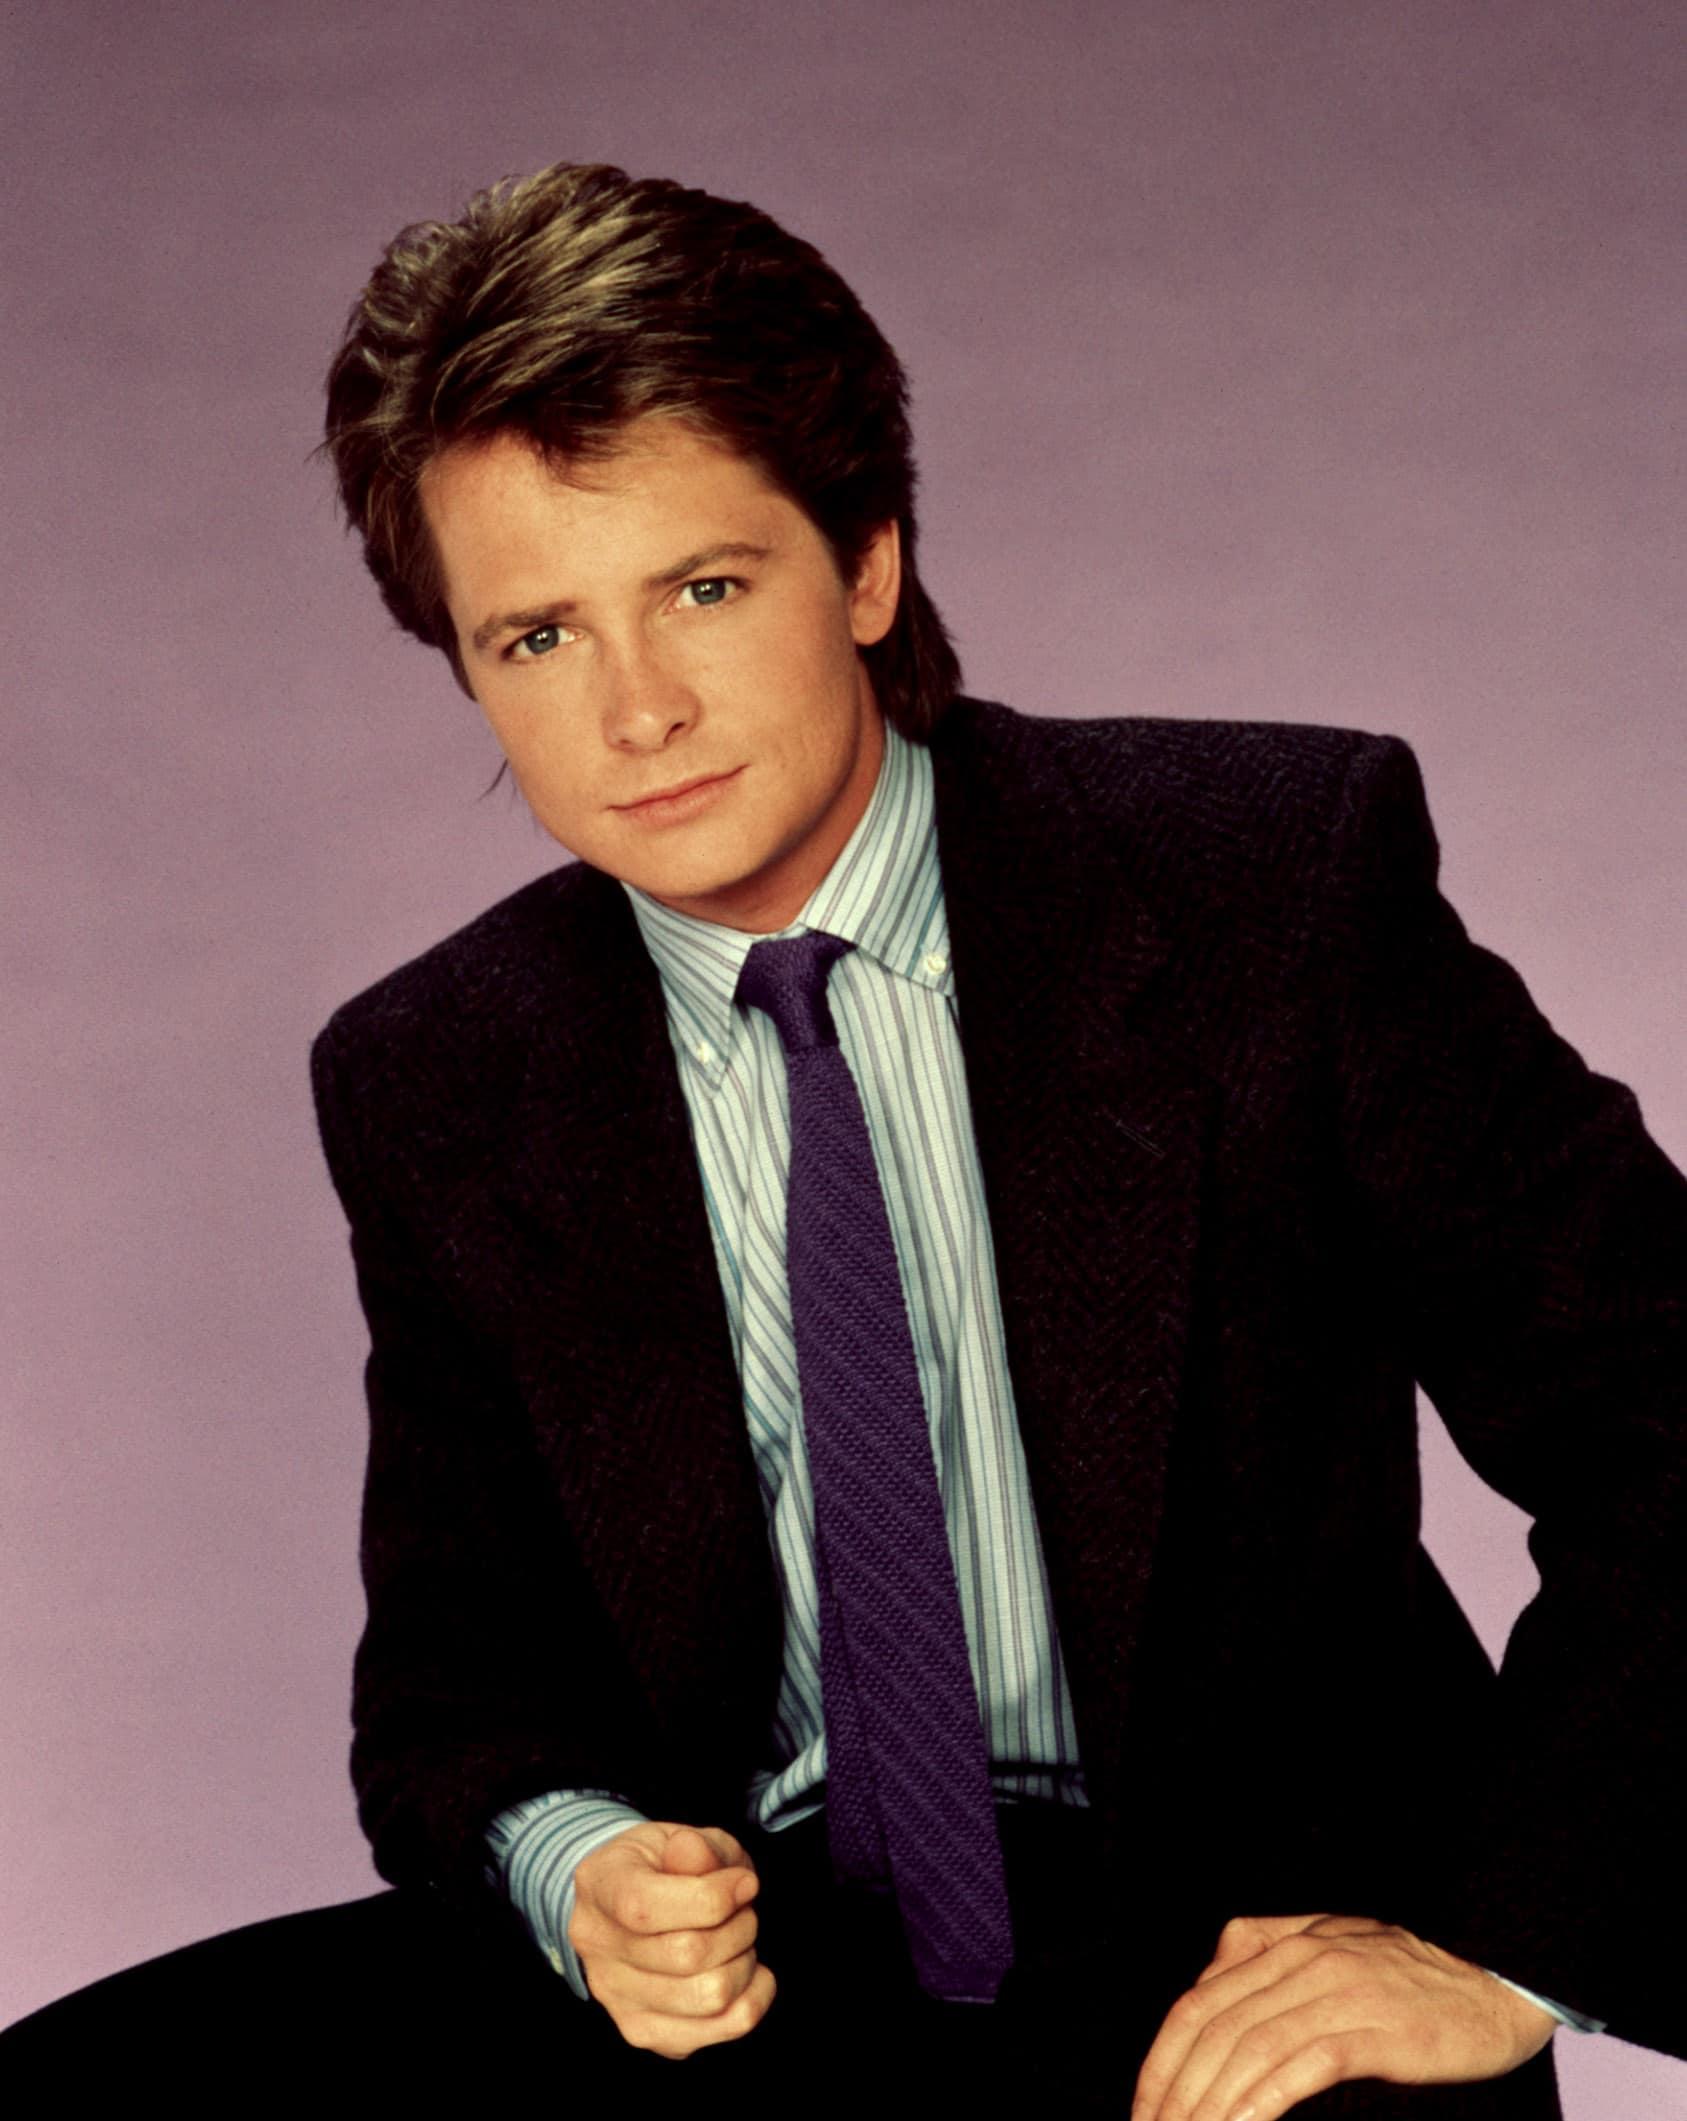 FAMILY TIES, Michael J. Fox, 1982-1989